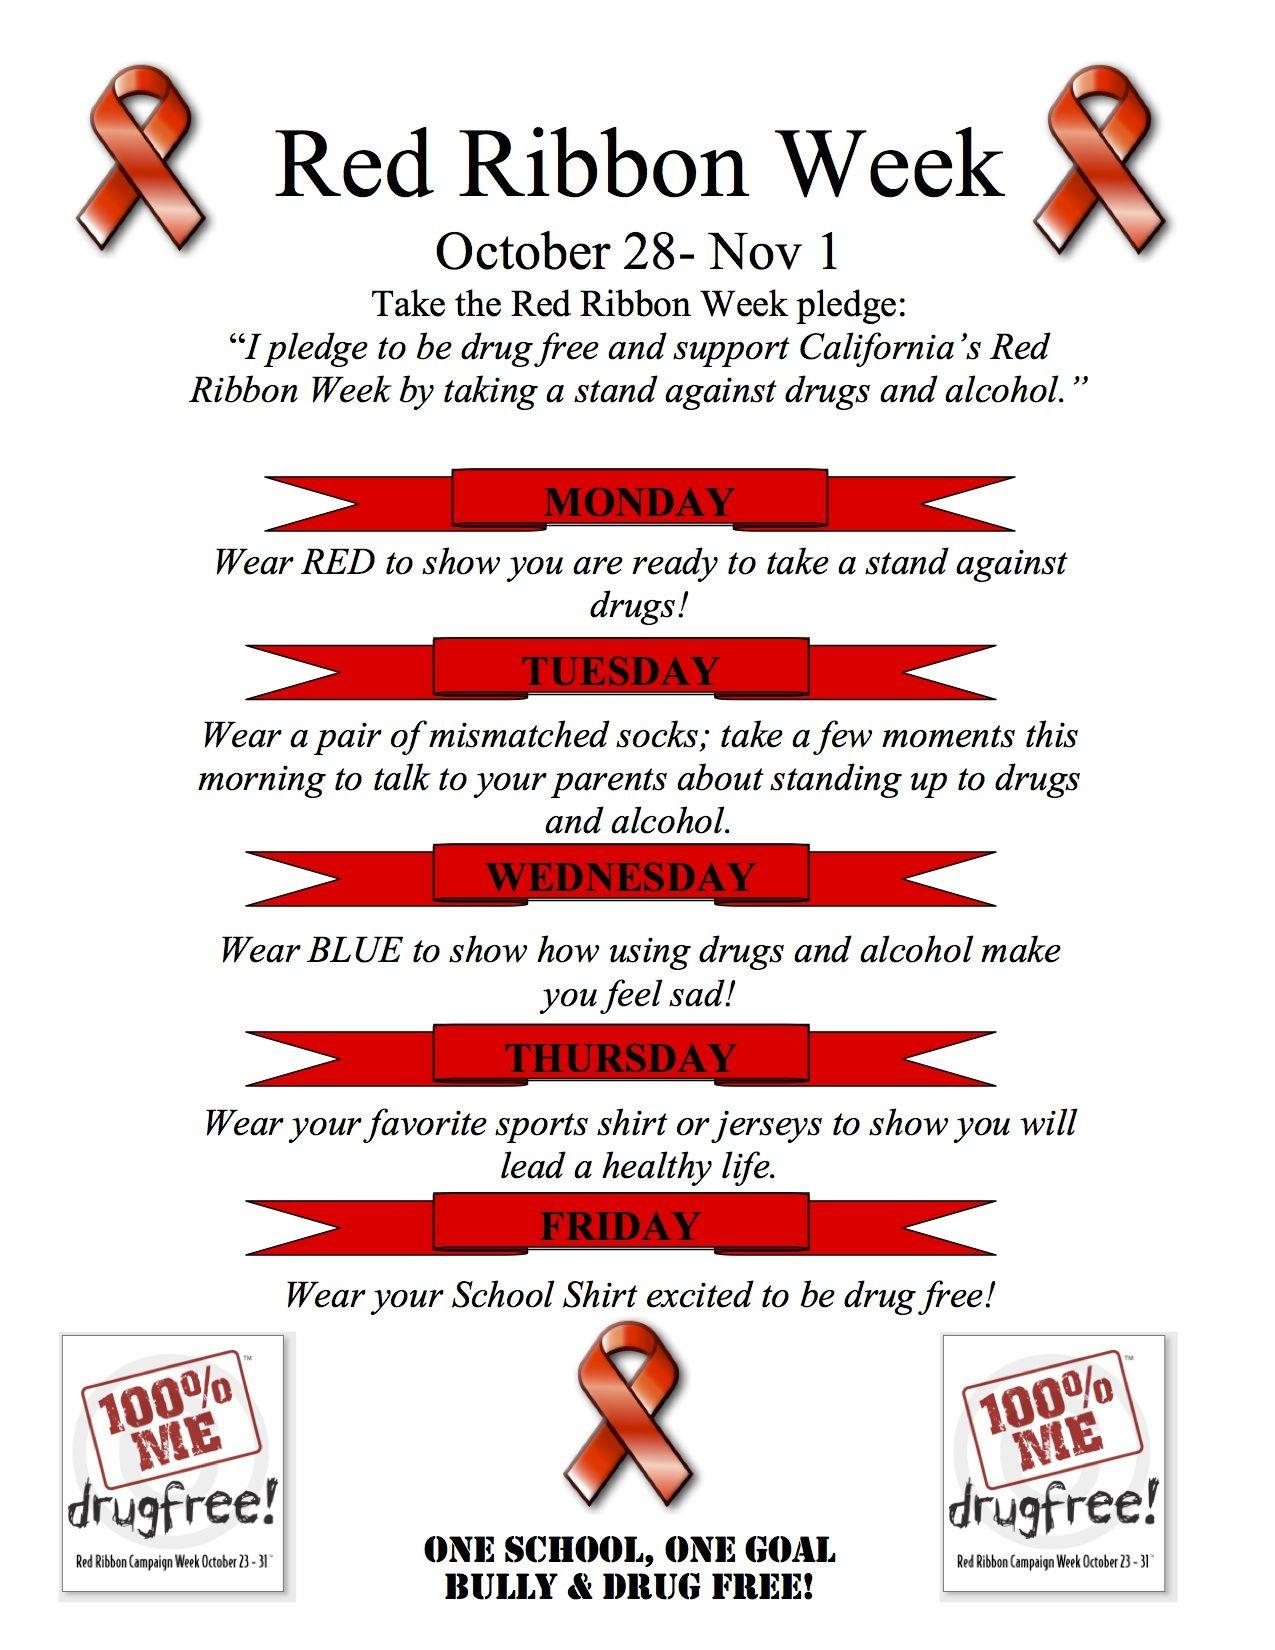 Red Ribbon Week Flyer Spirit Days Ideas   Pta Resources & Ideas - Free Printable Drug Free Pledge Cards